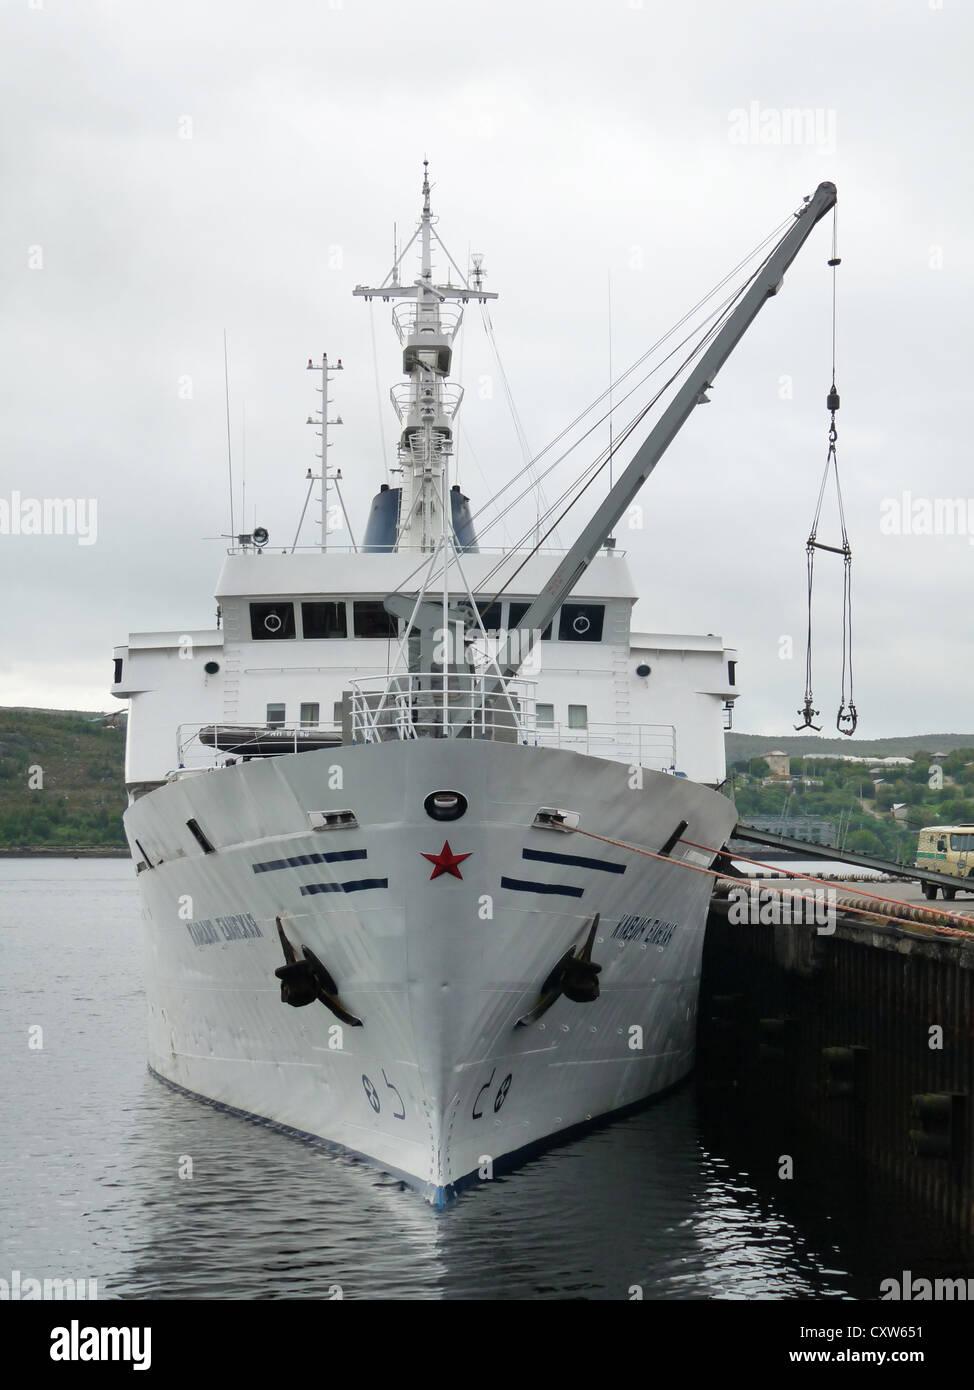 ship, the ship Claudia Elanskaya, Sea Station Murmansk, Murmansk, Russia, north, polar circle, port, - Stock Image